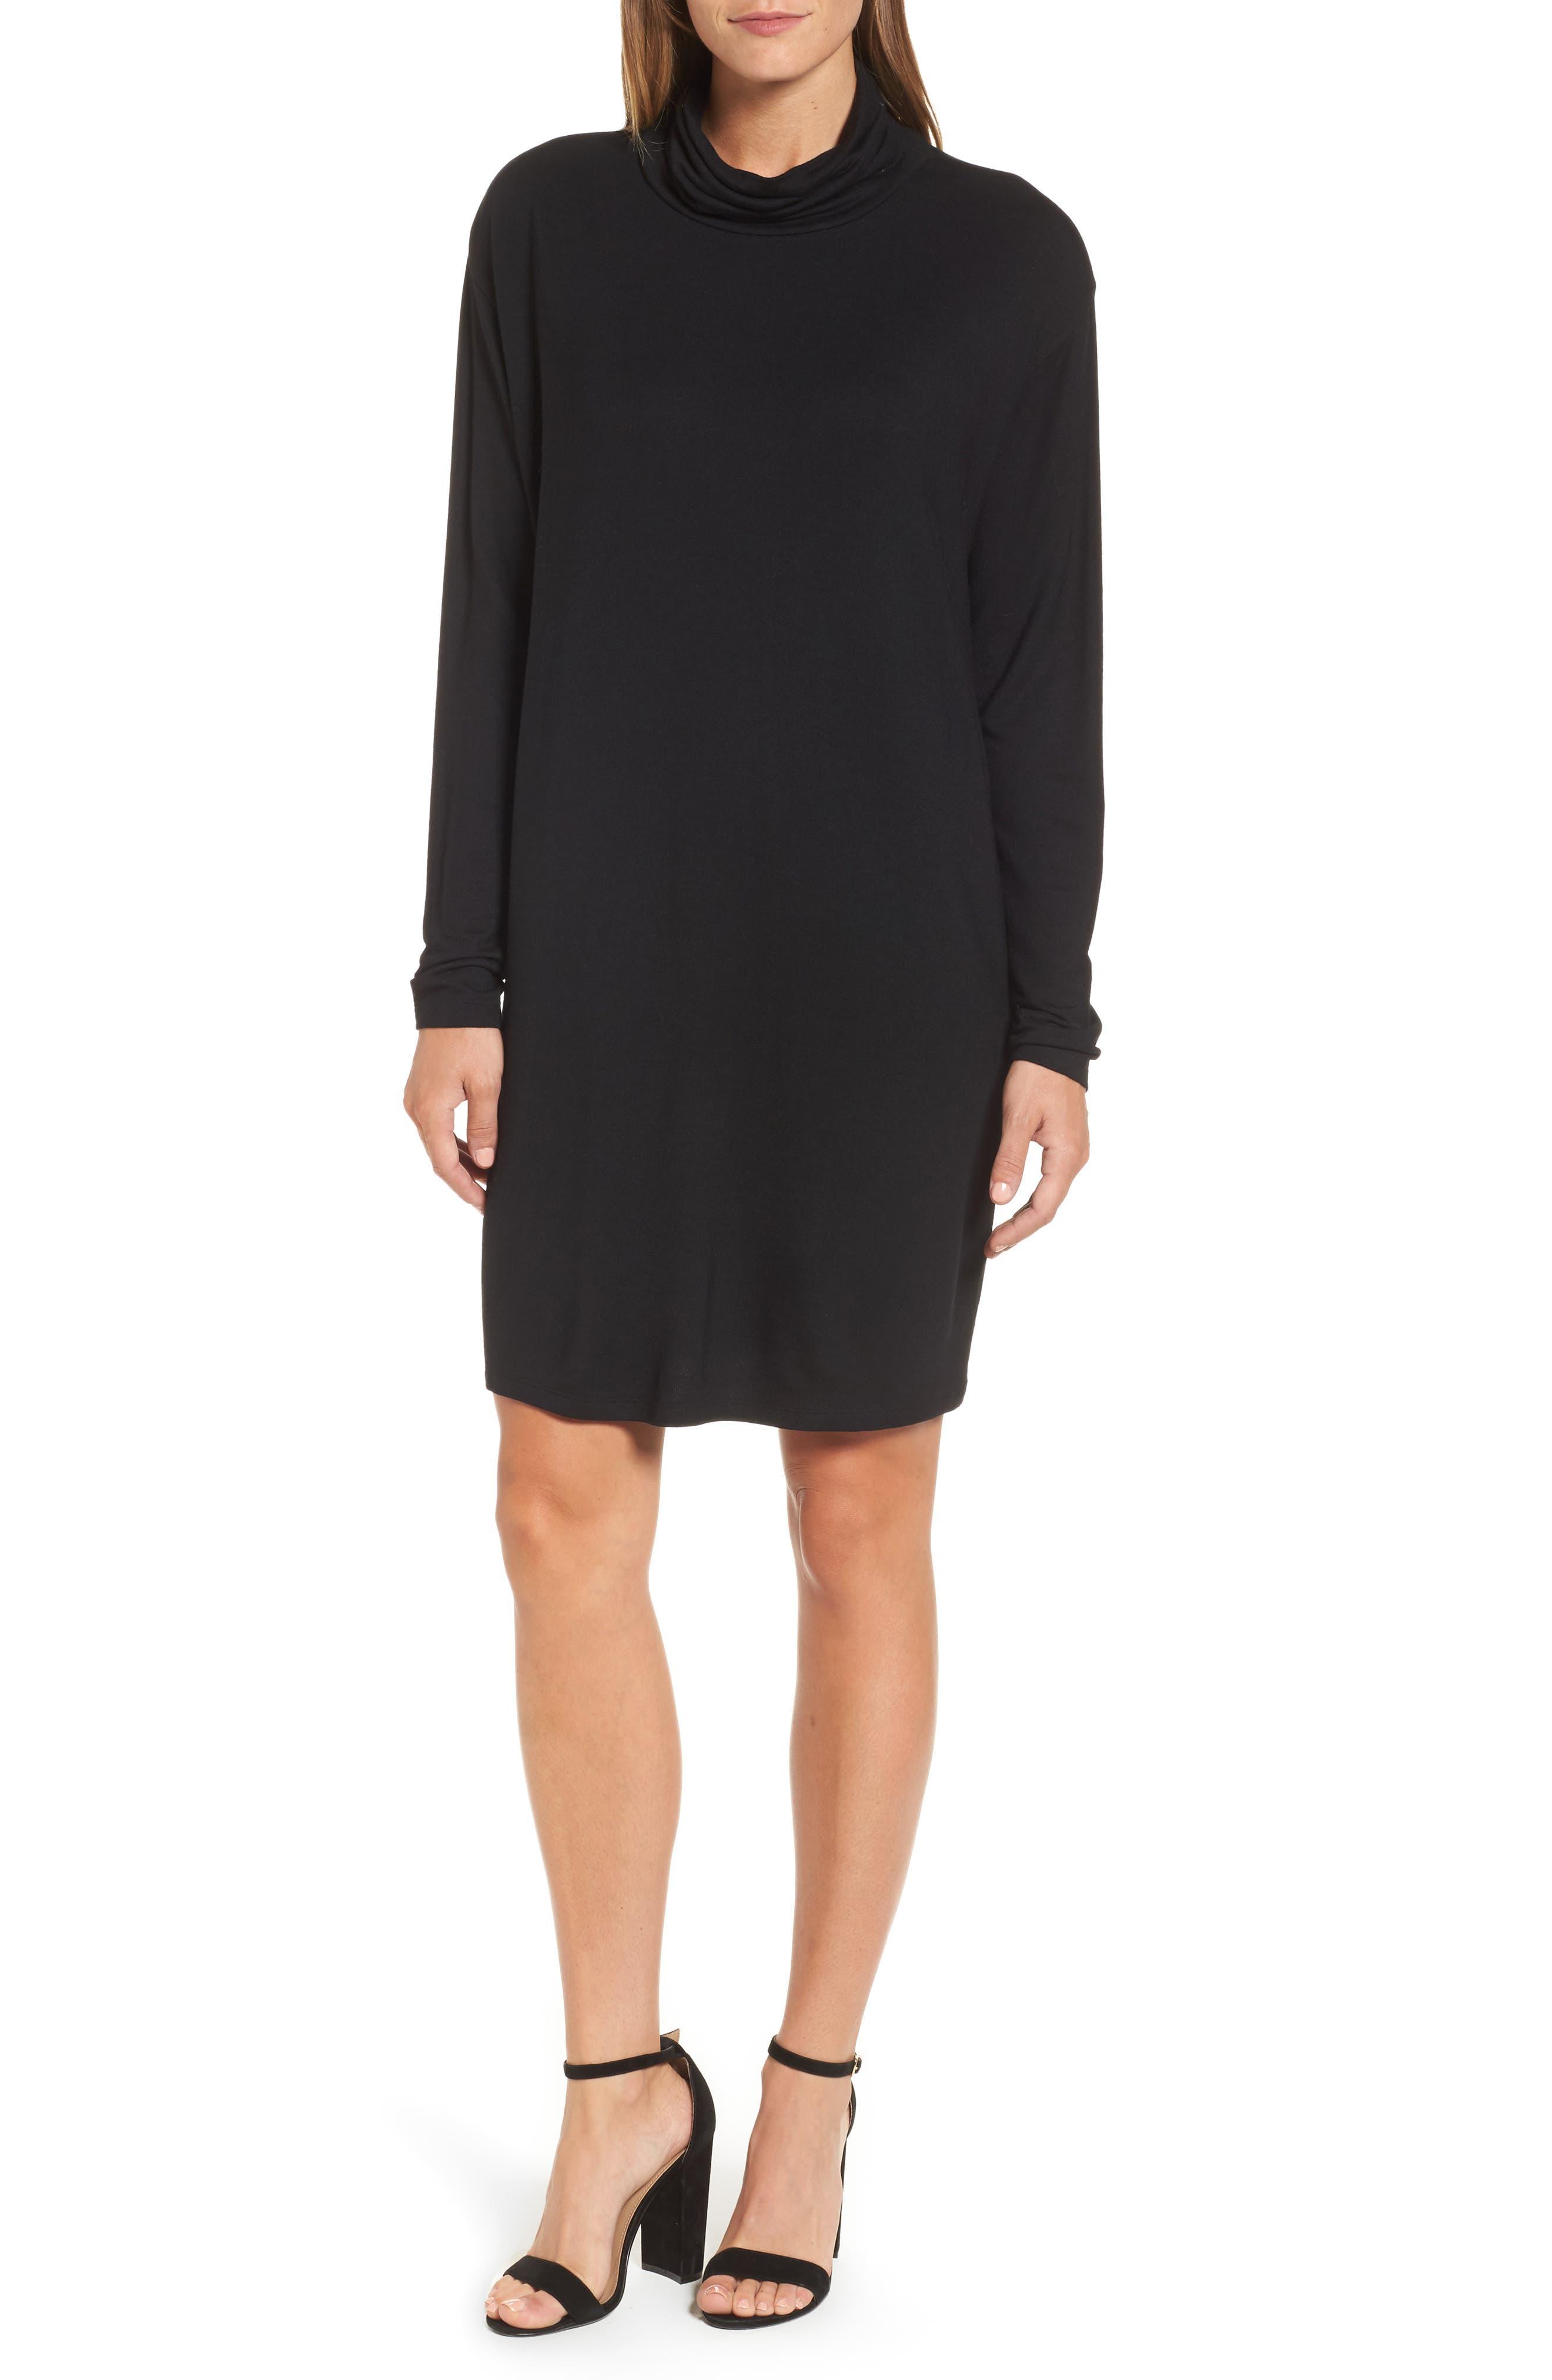 PRESS Slouchy Turtleneck Dress